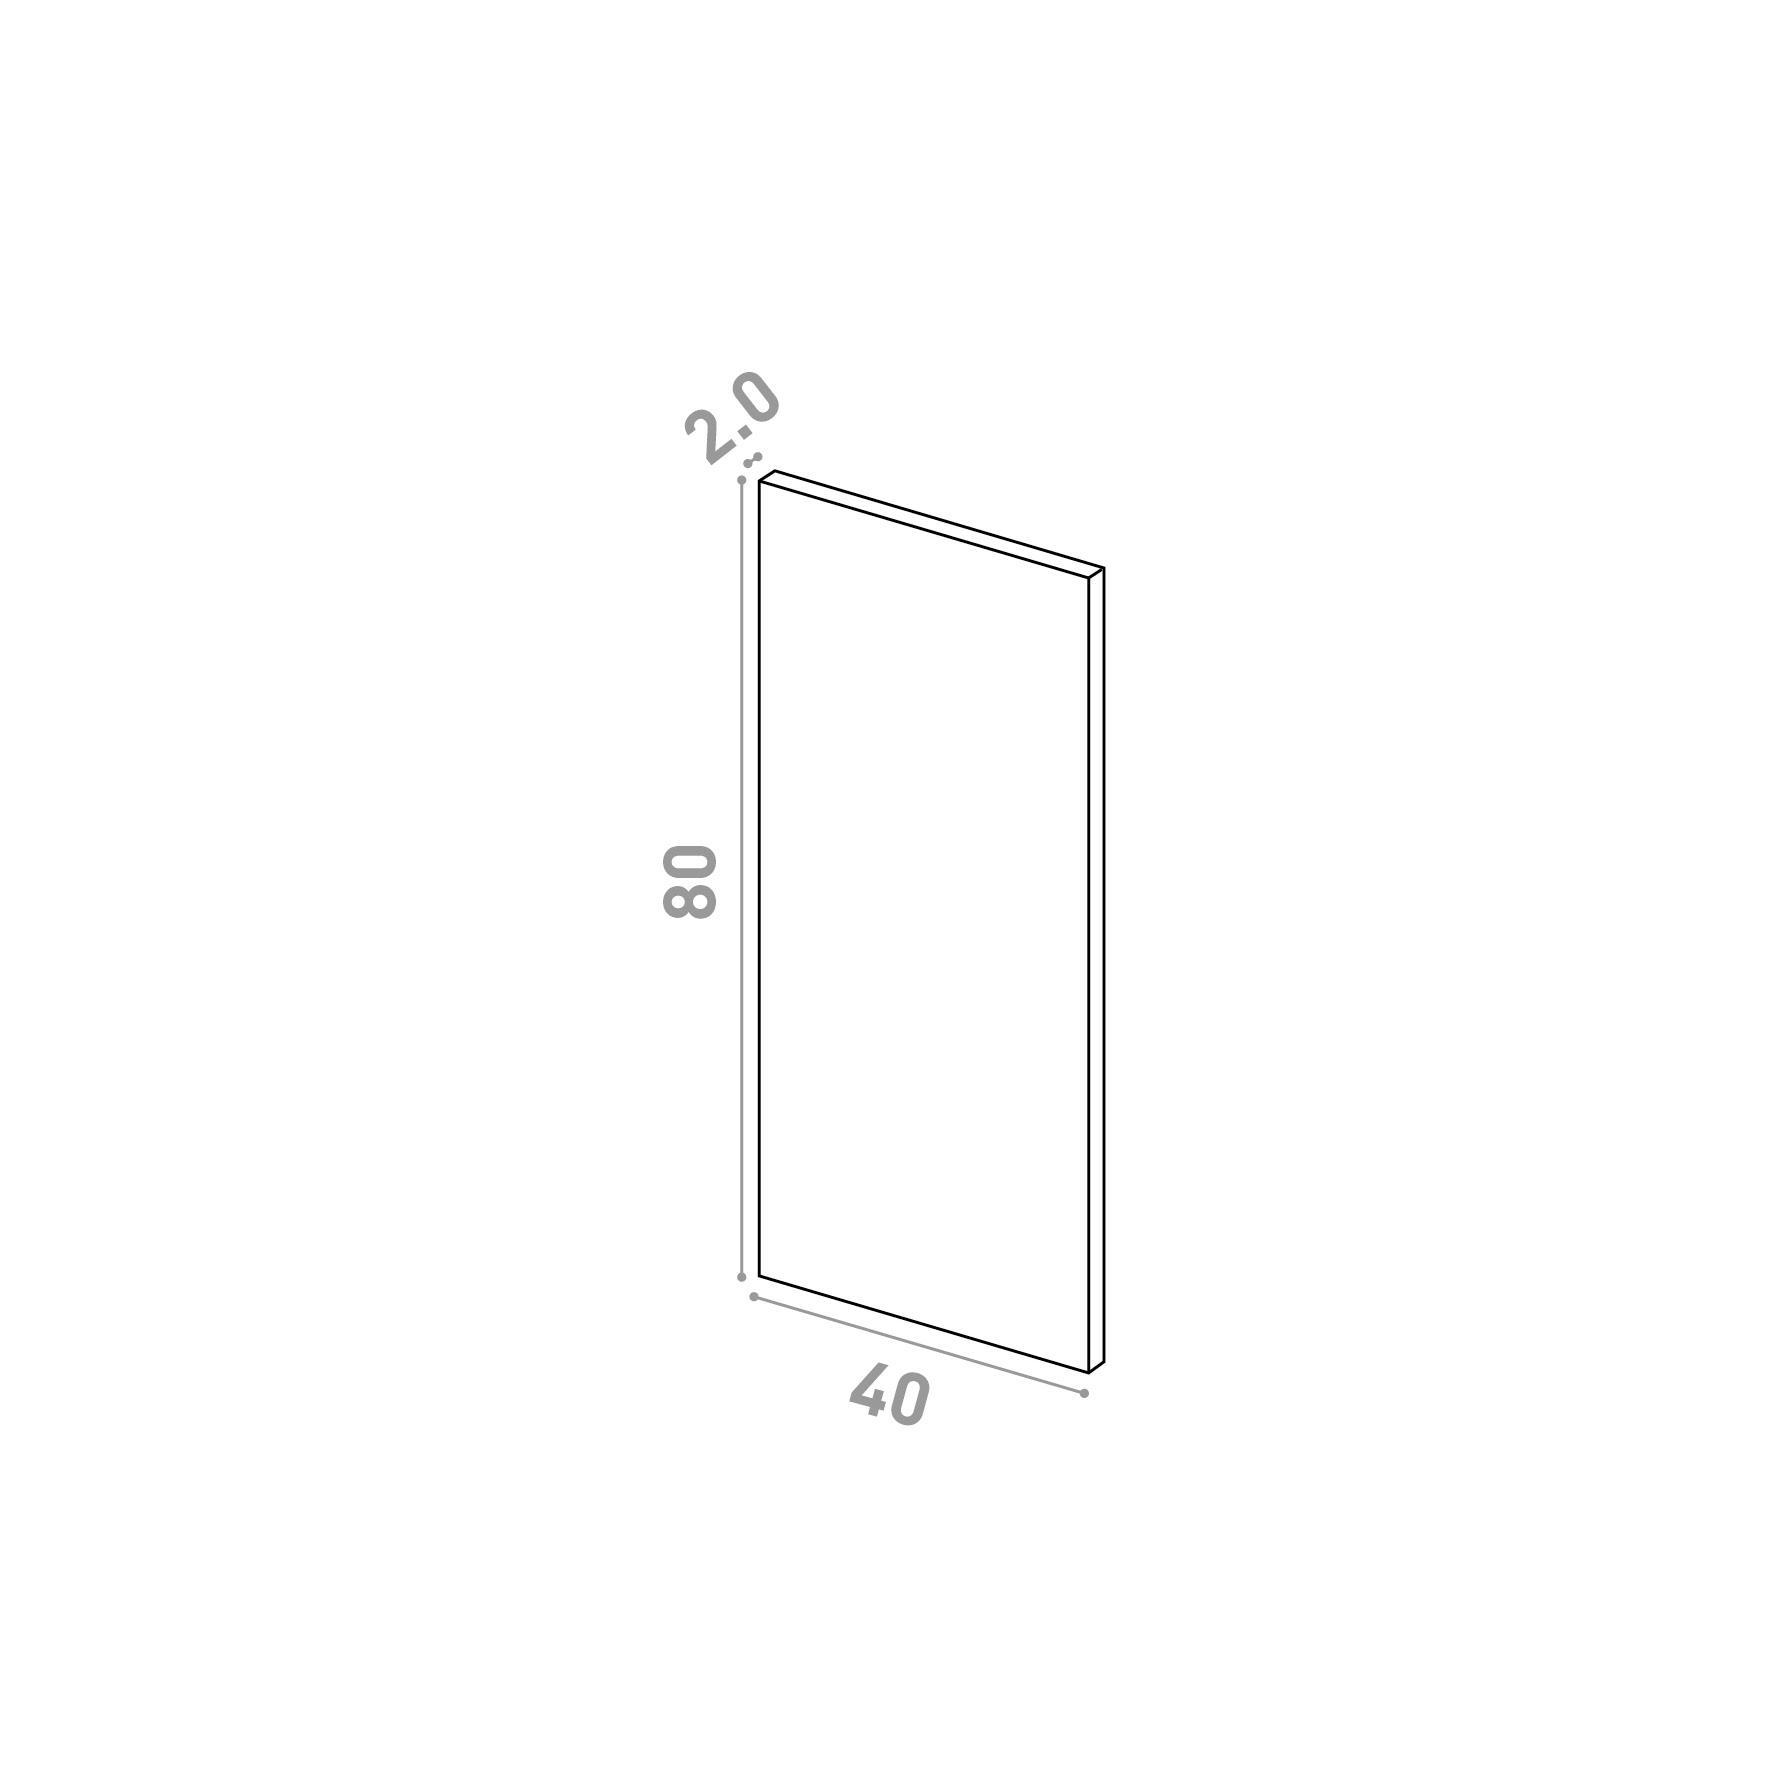 Porte 40X80cm   design lisse   chêne naturel